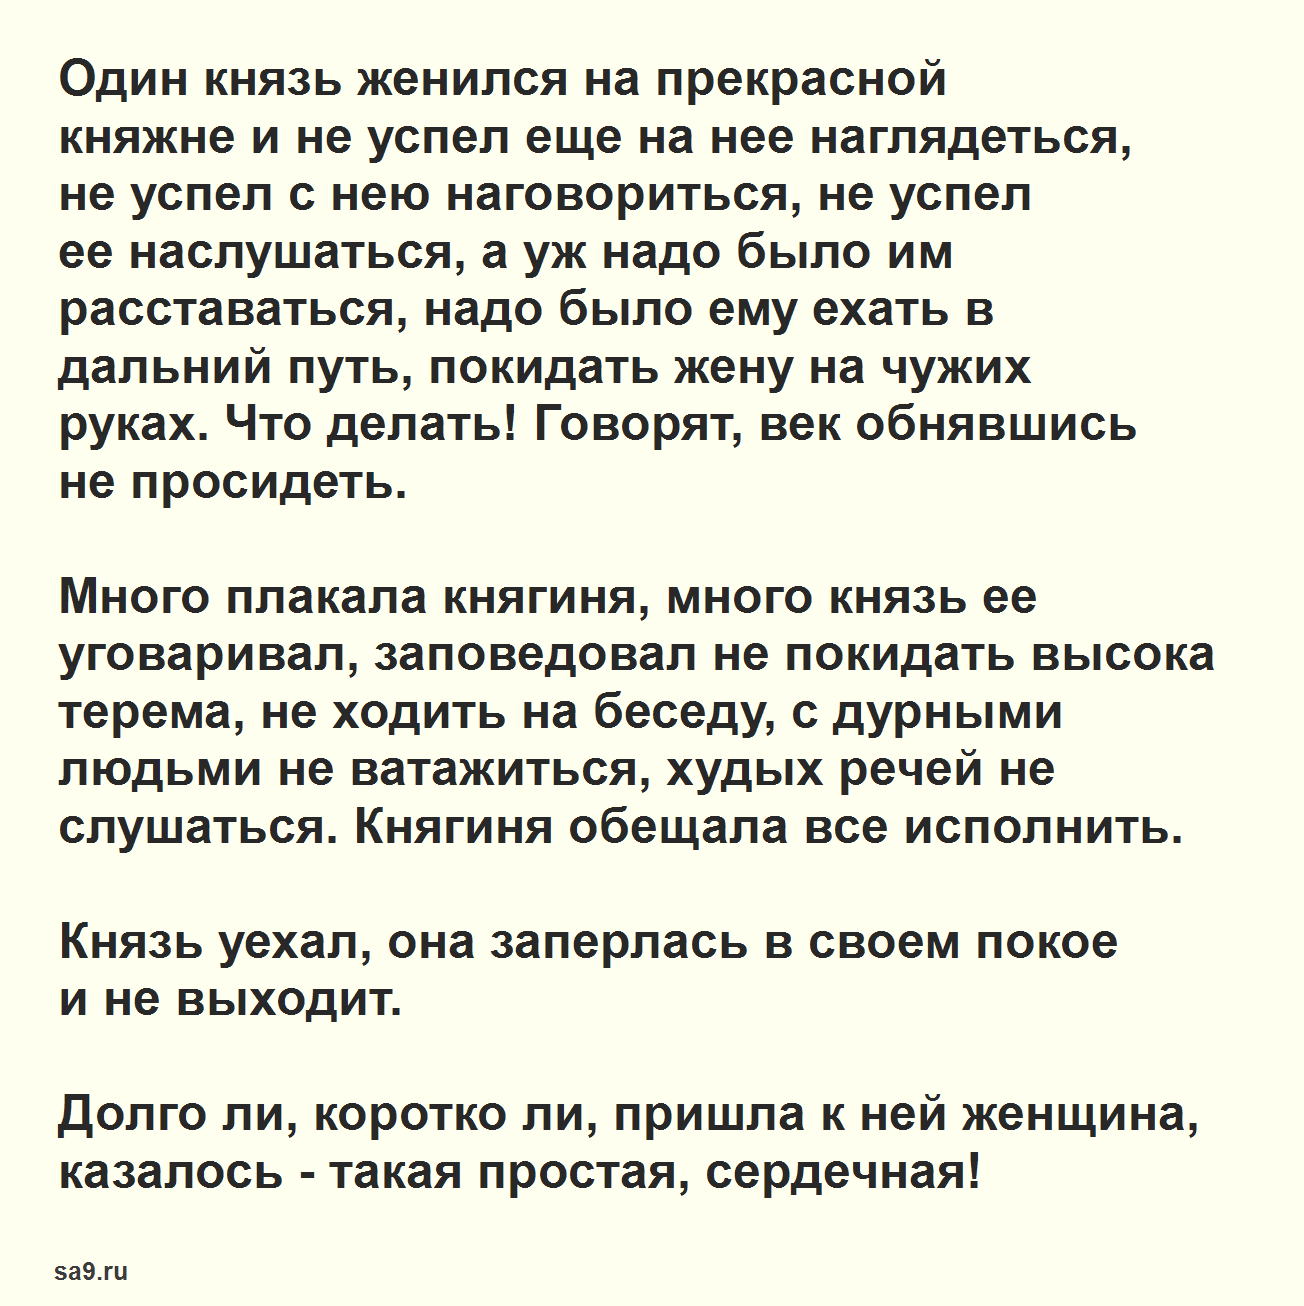 Белая уточка - русская народная сказка